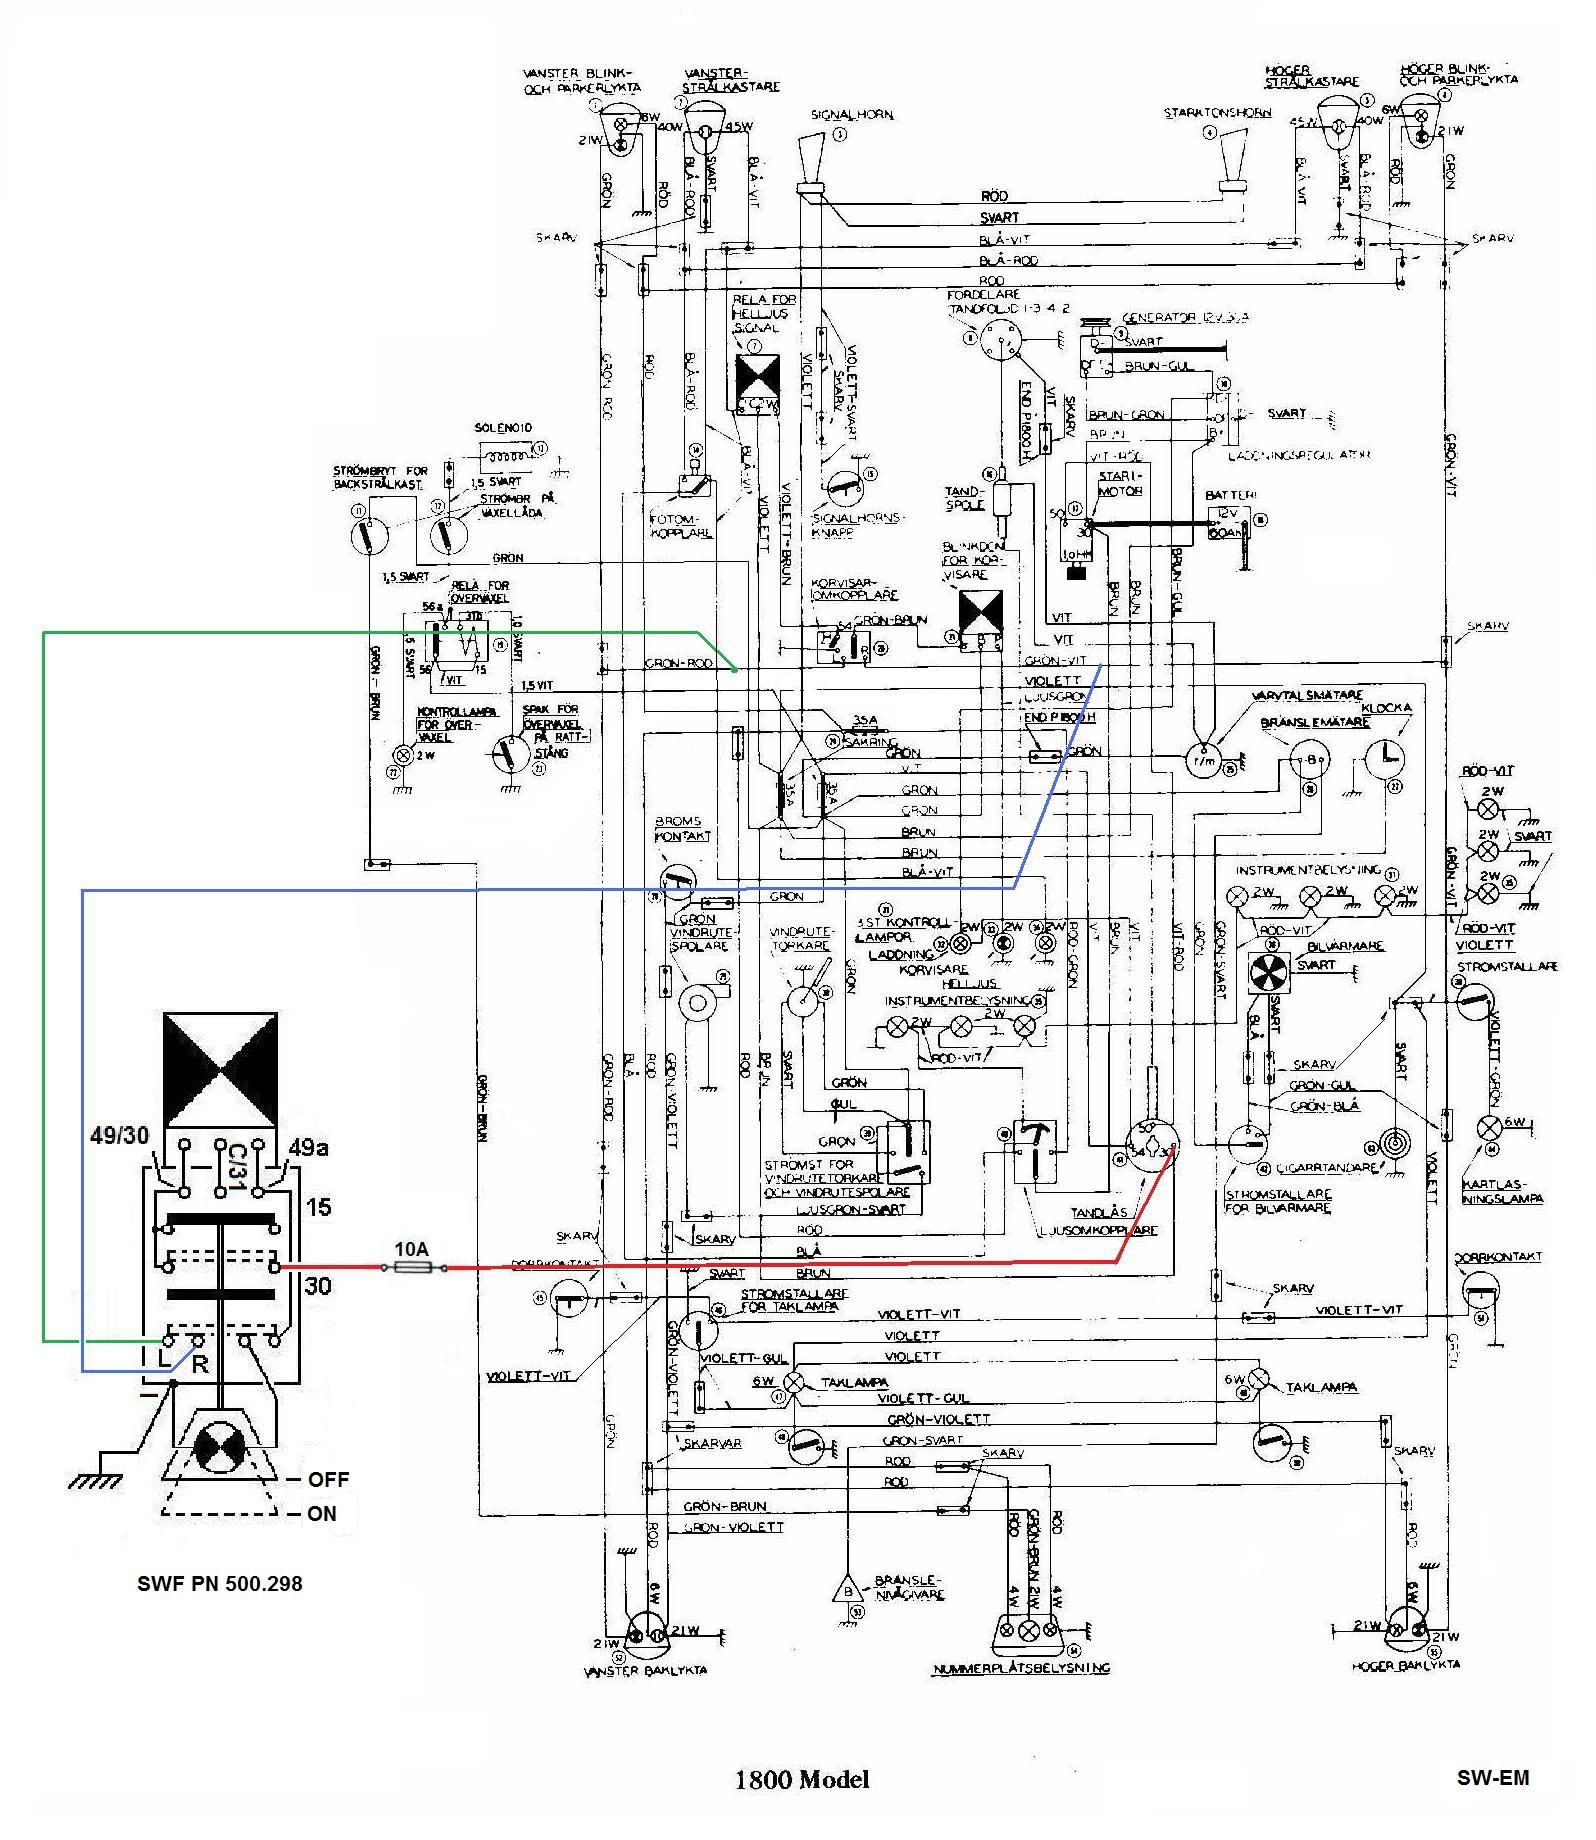 1800 Wiring Diagram SWF E flasher Switch